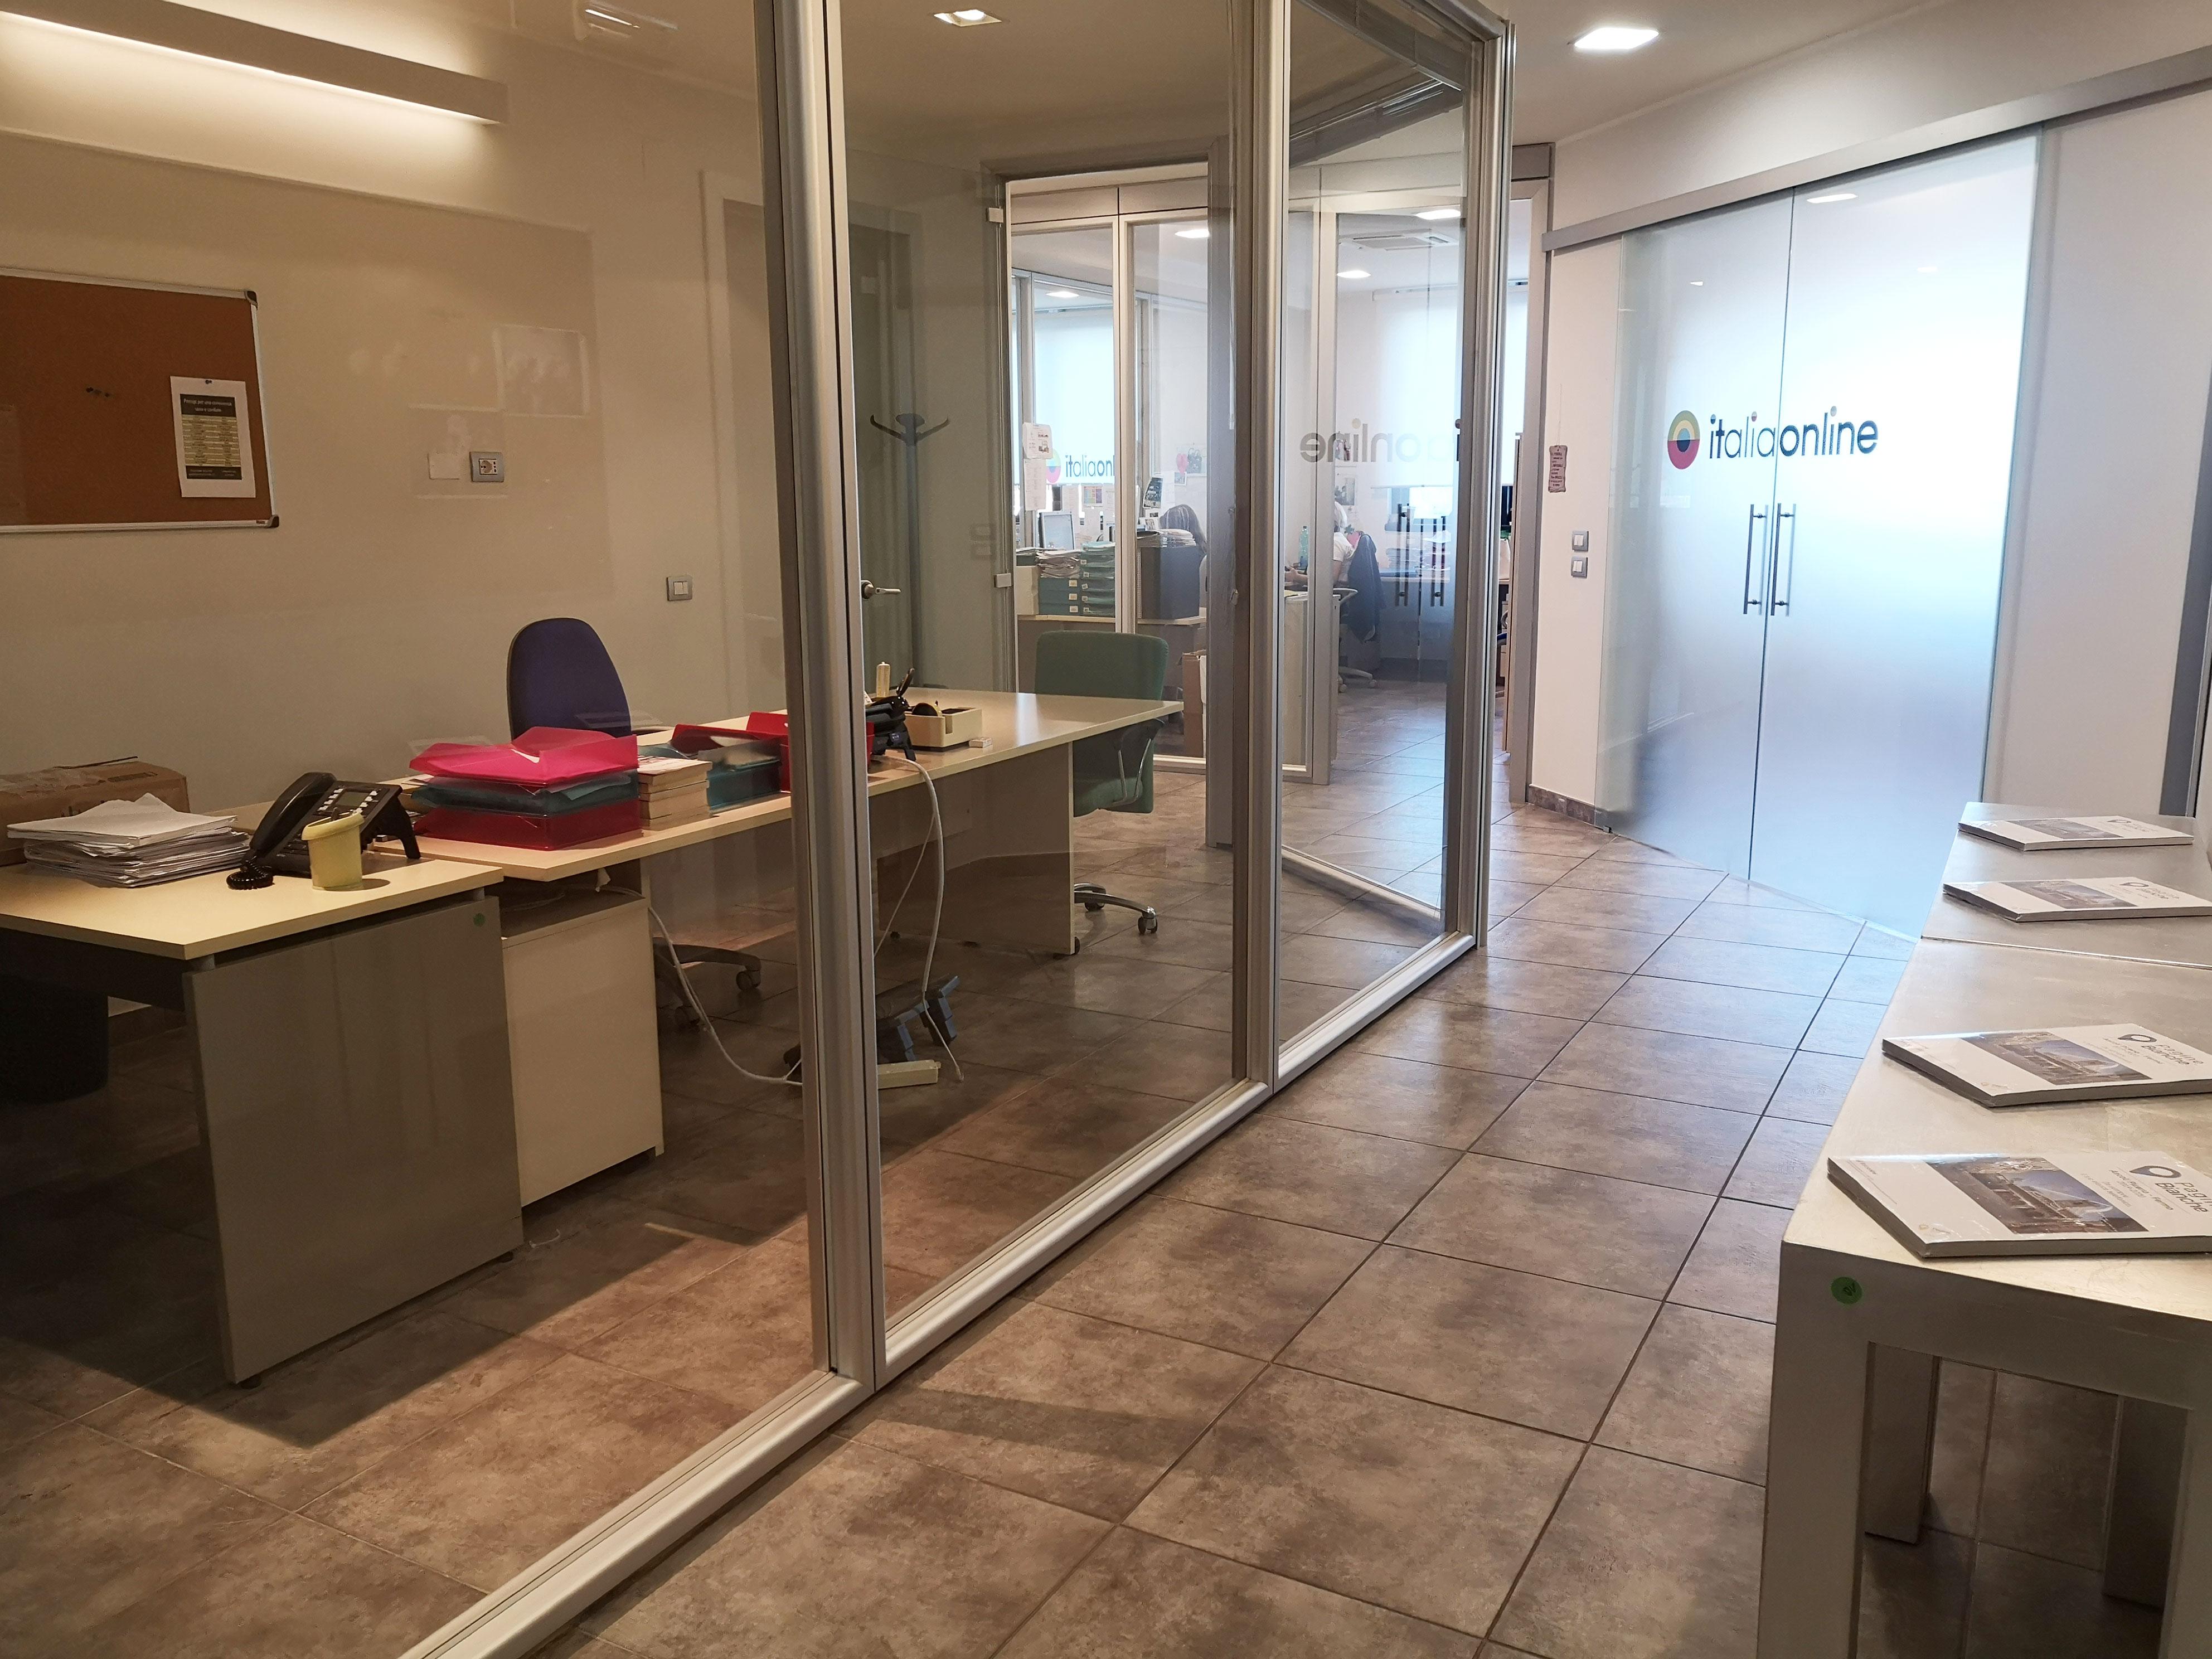 Web Agency San Benedetto del Tronto